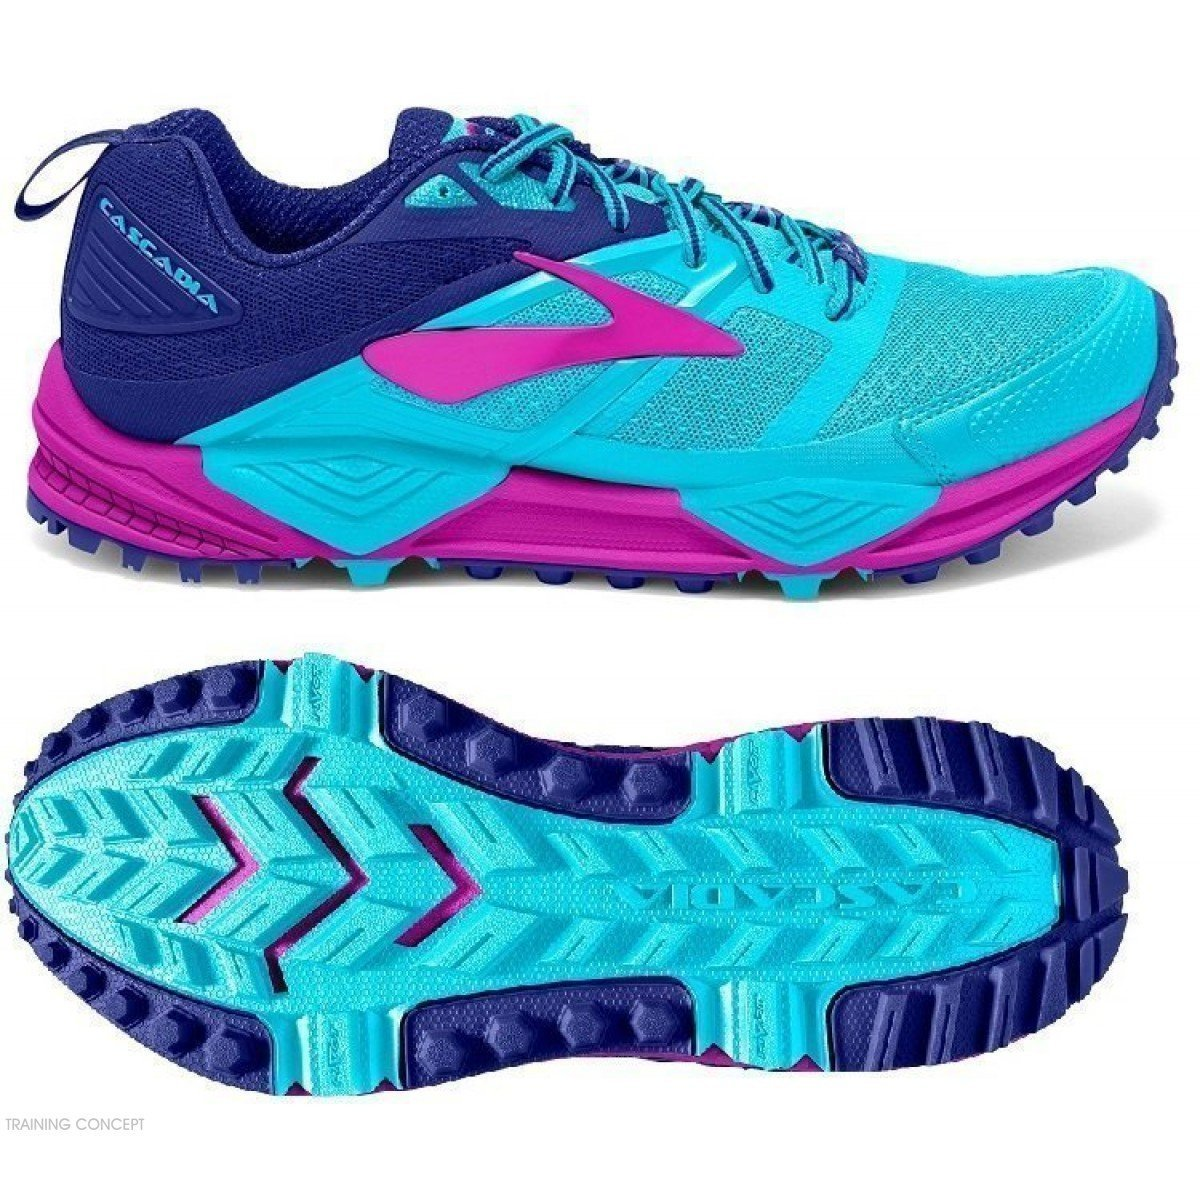 a10443a8d6c chaussure de trail running pour femme brooks cascadia 12